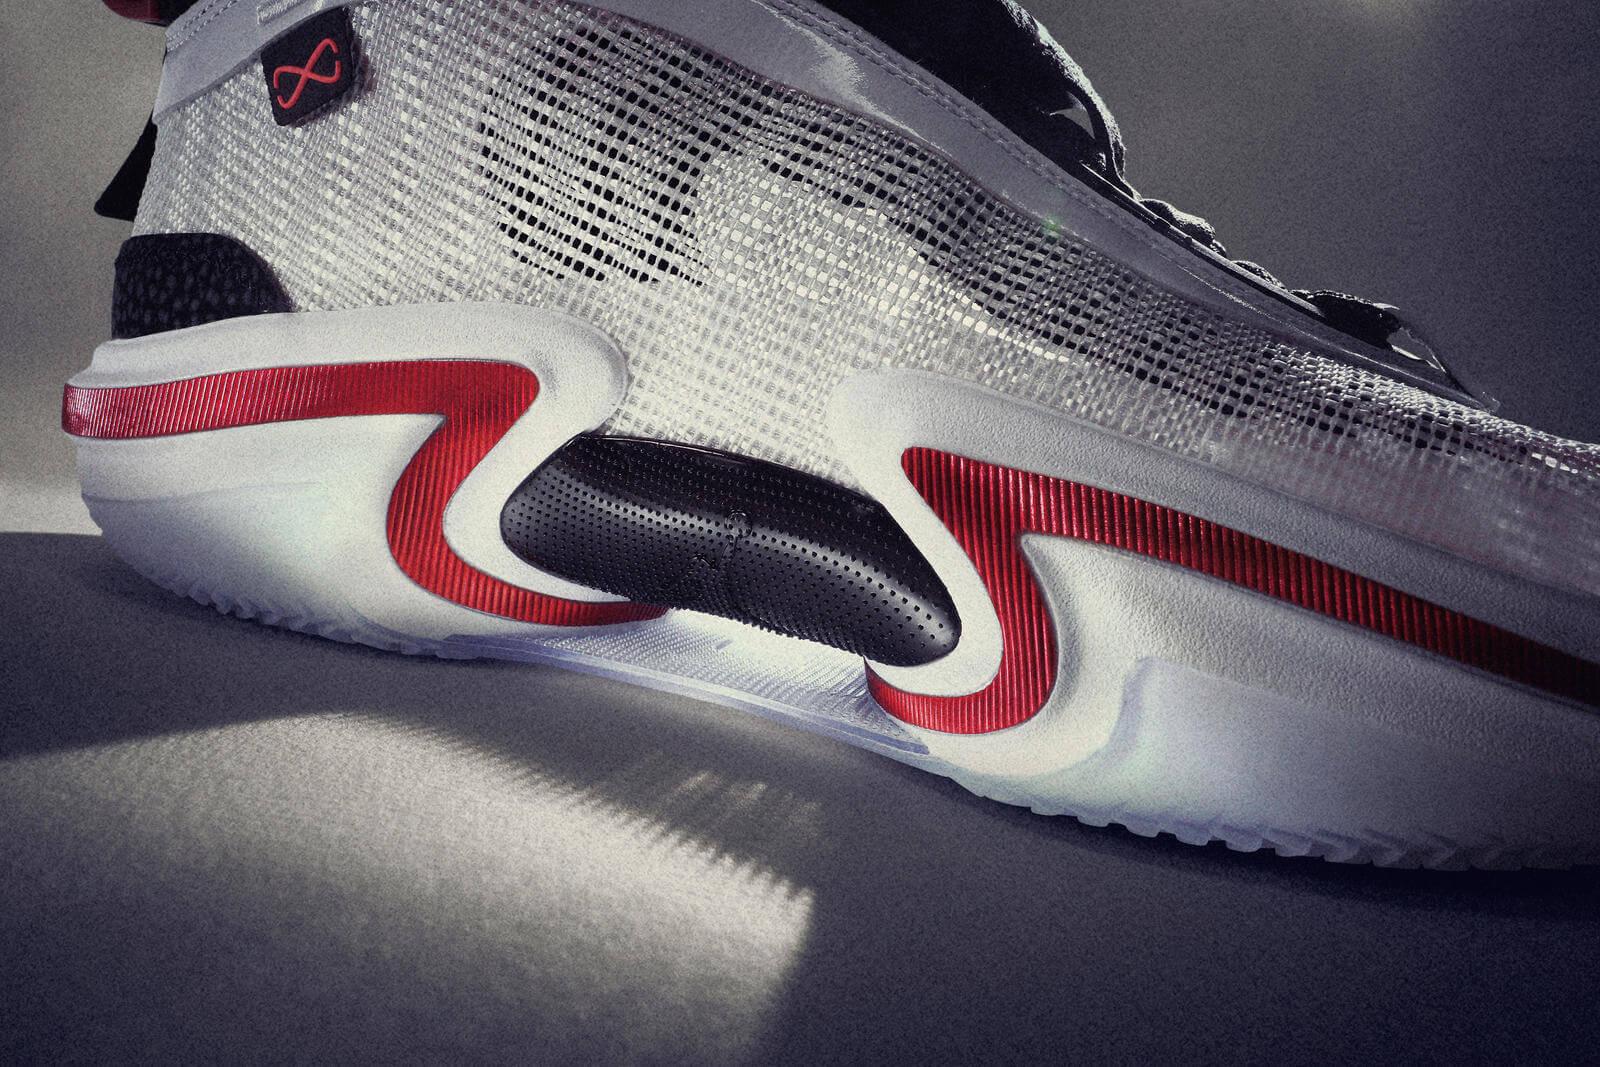 sole details of the Nike Air Jordan XXXVI- Psychic Energy